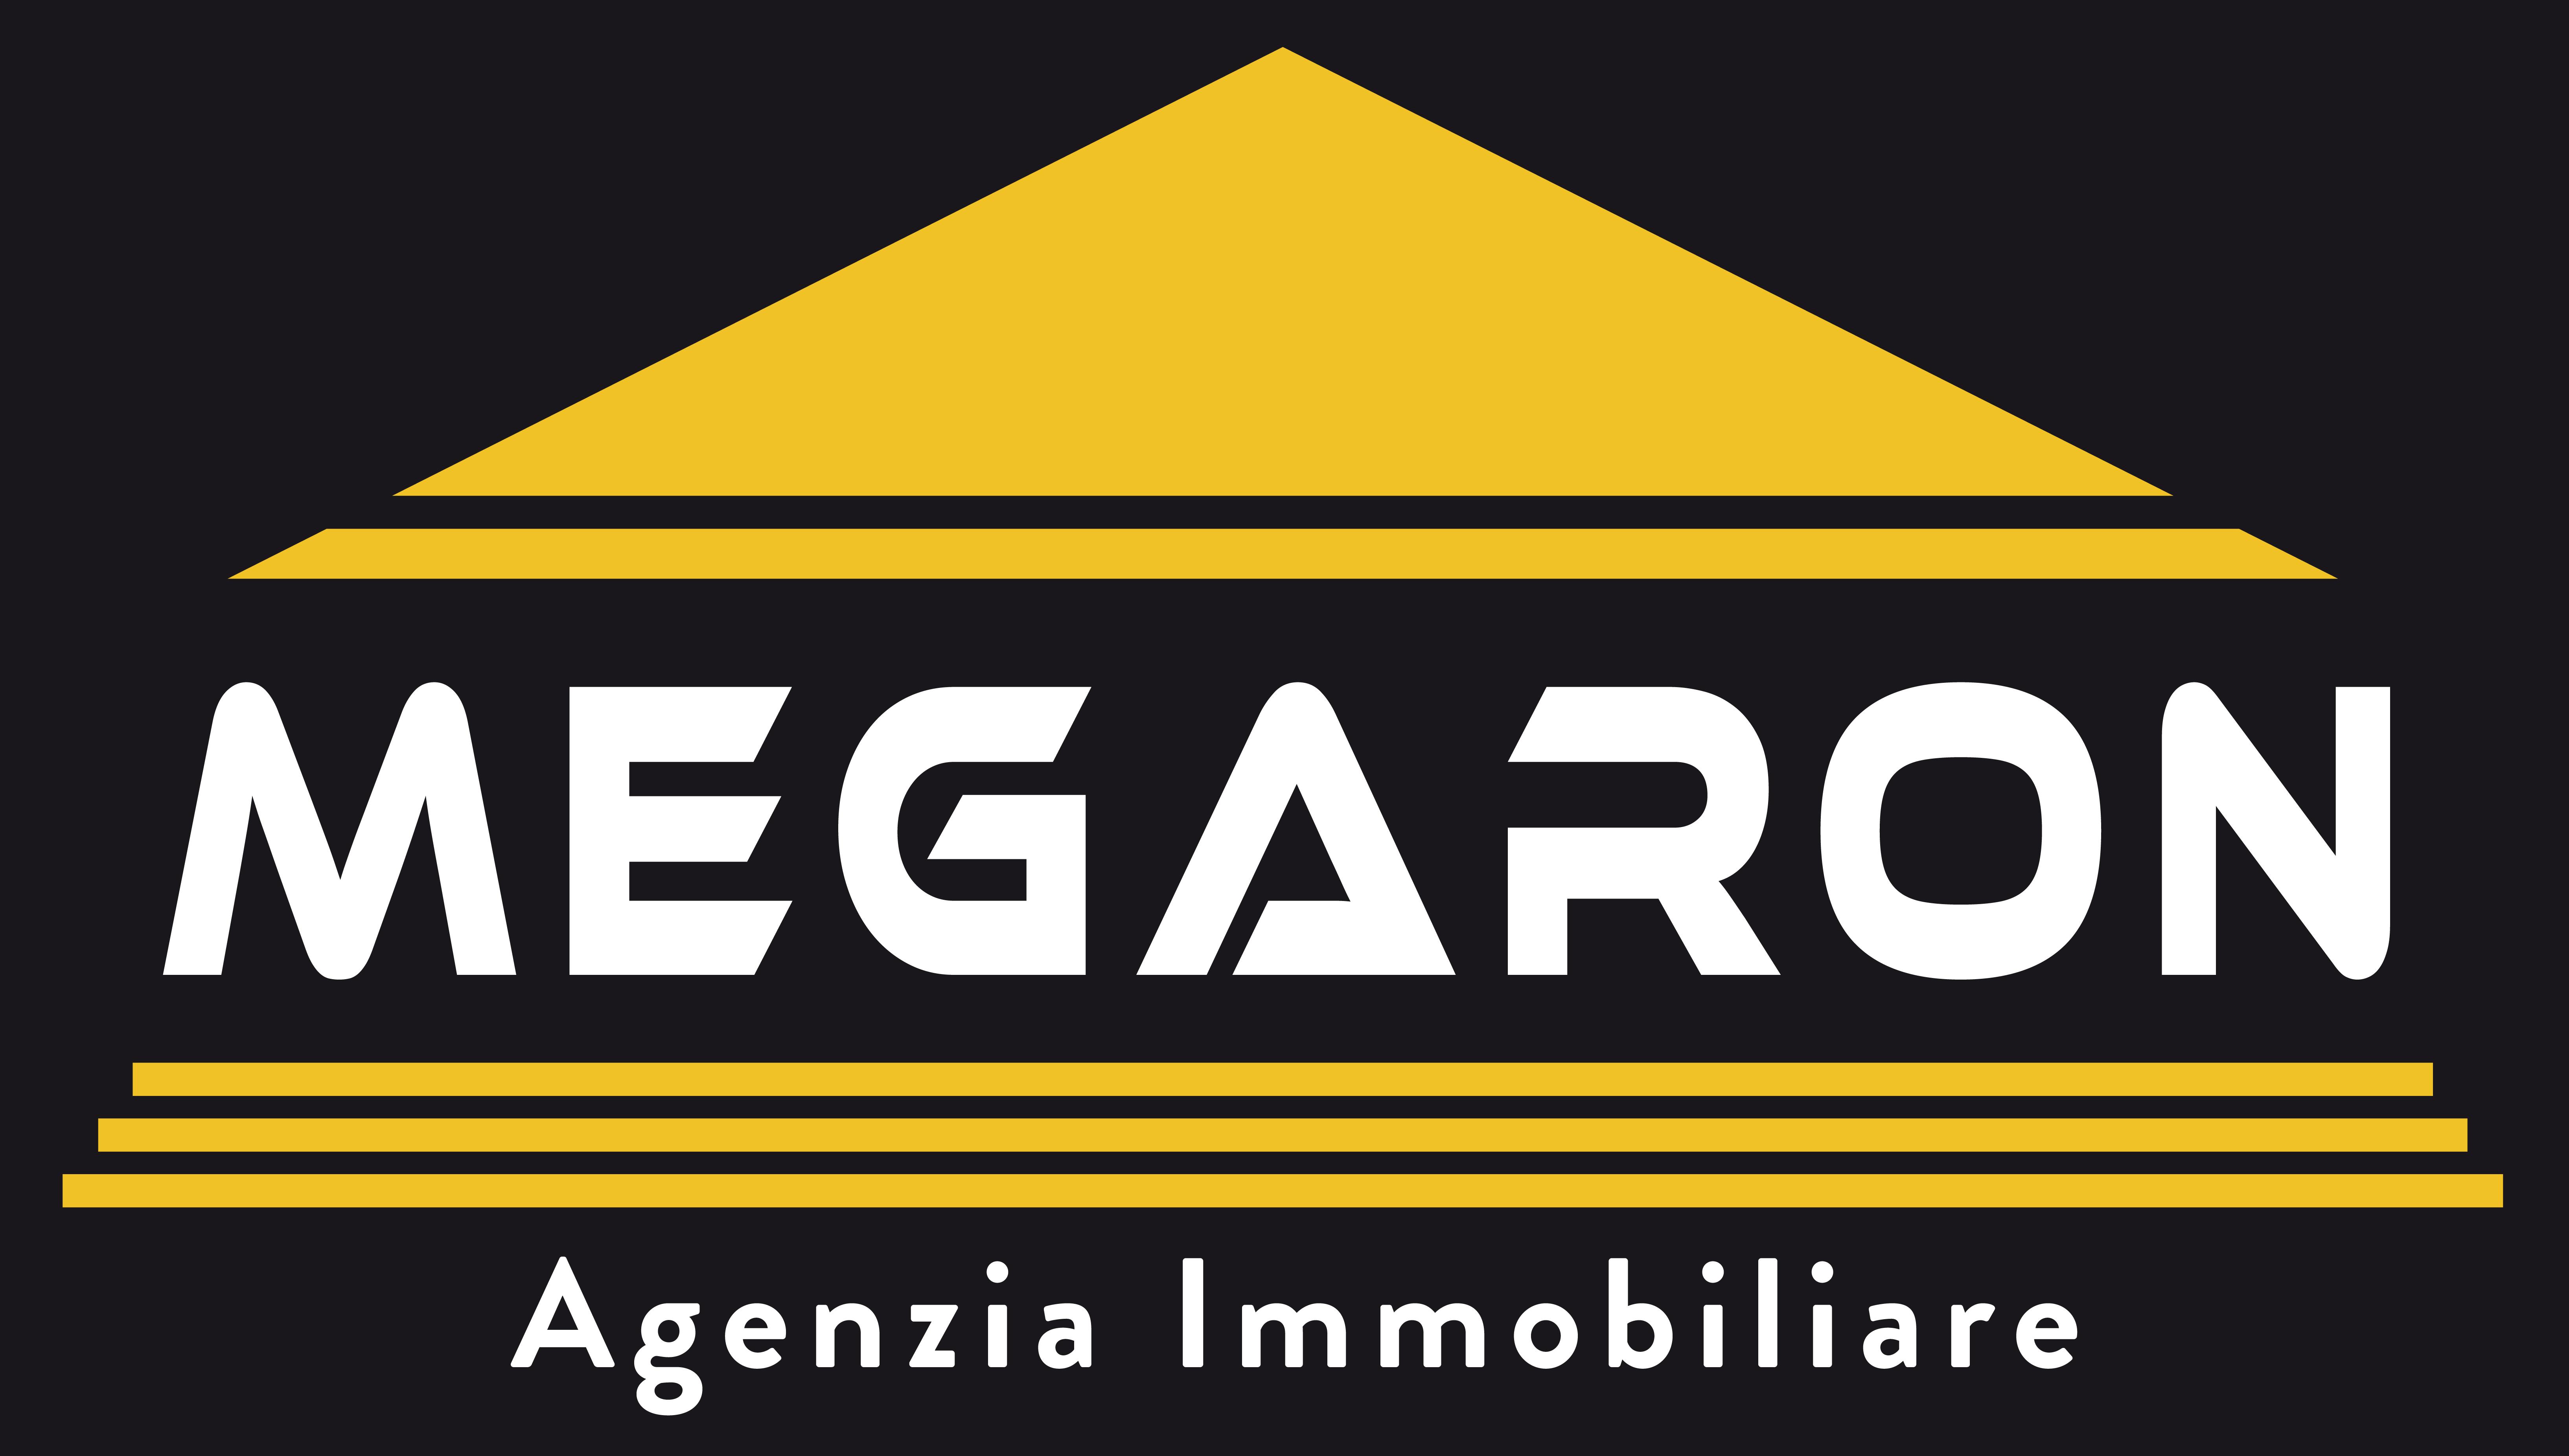 logo MEGARON - Ag. Immobiliare Pisa